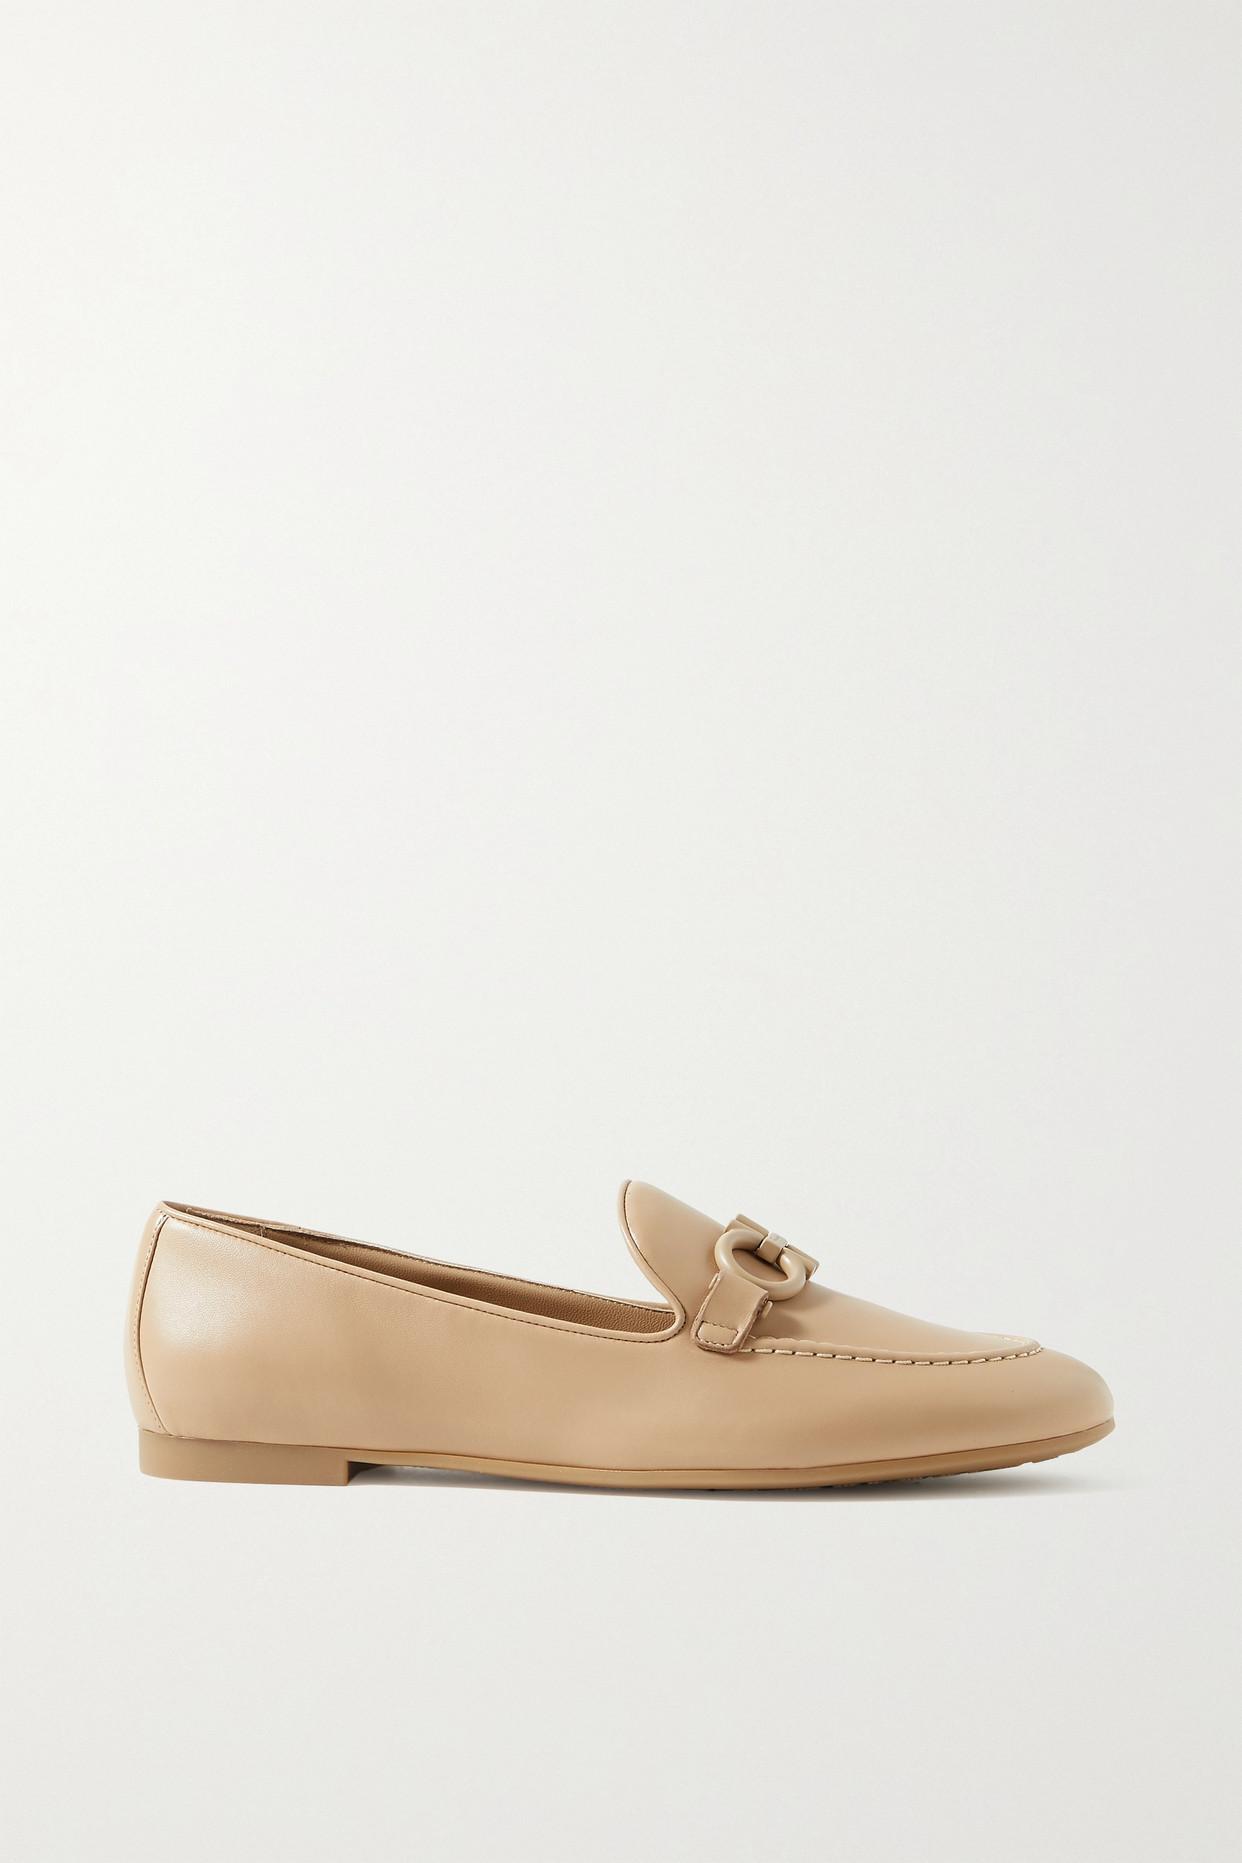 SALVATORE FERRAGAMO - Trifoglio Embellished Leather Loafers - Neutrals - US10